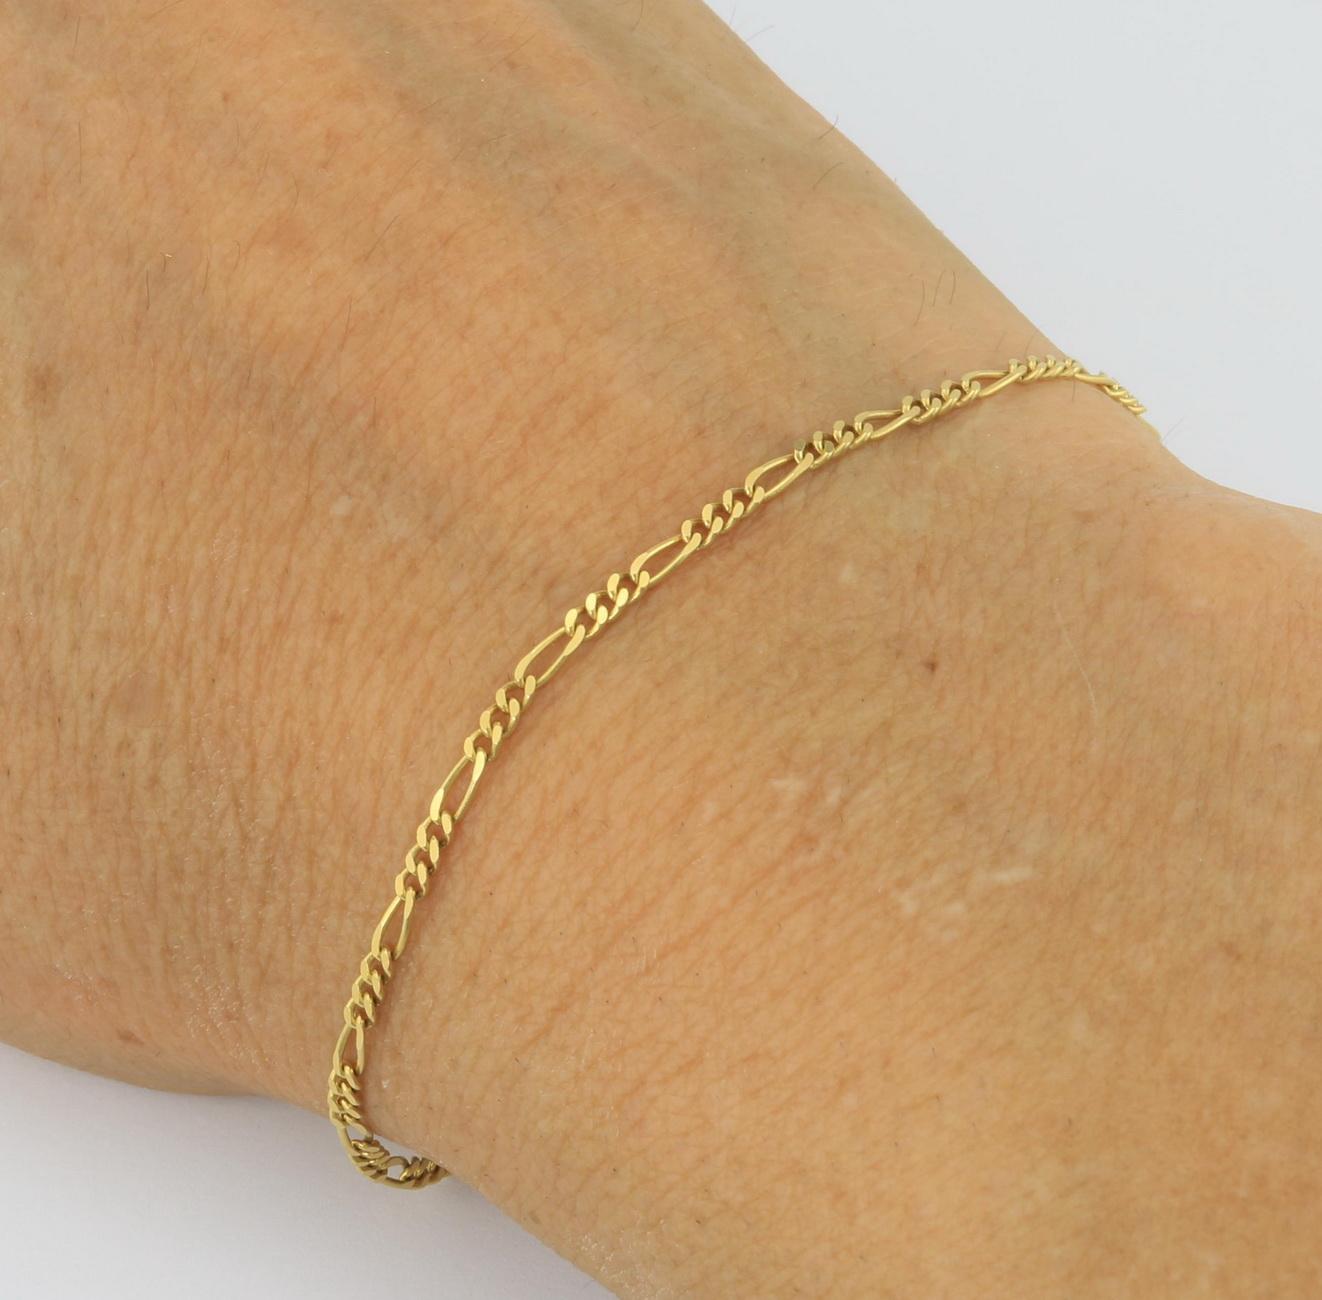 10K-Yellow-Gold-2-5mm-Womens-Dainty-Figaro-Chain-Link-Bracelet-Anklet-7-034-8-034-9-034 thumbnail 13